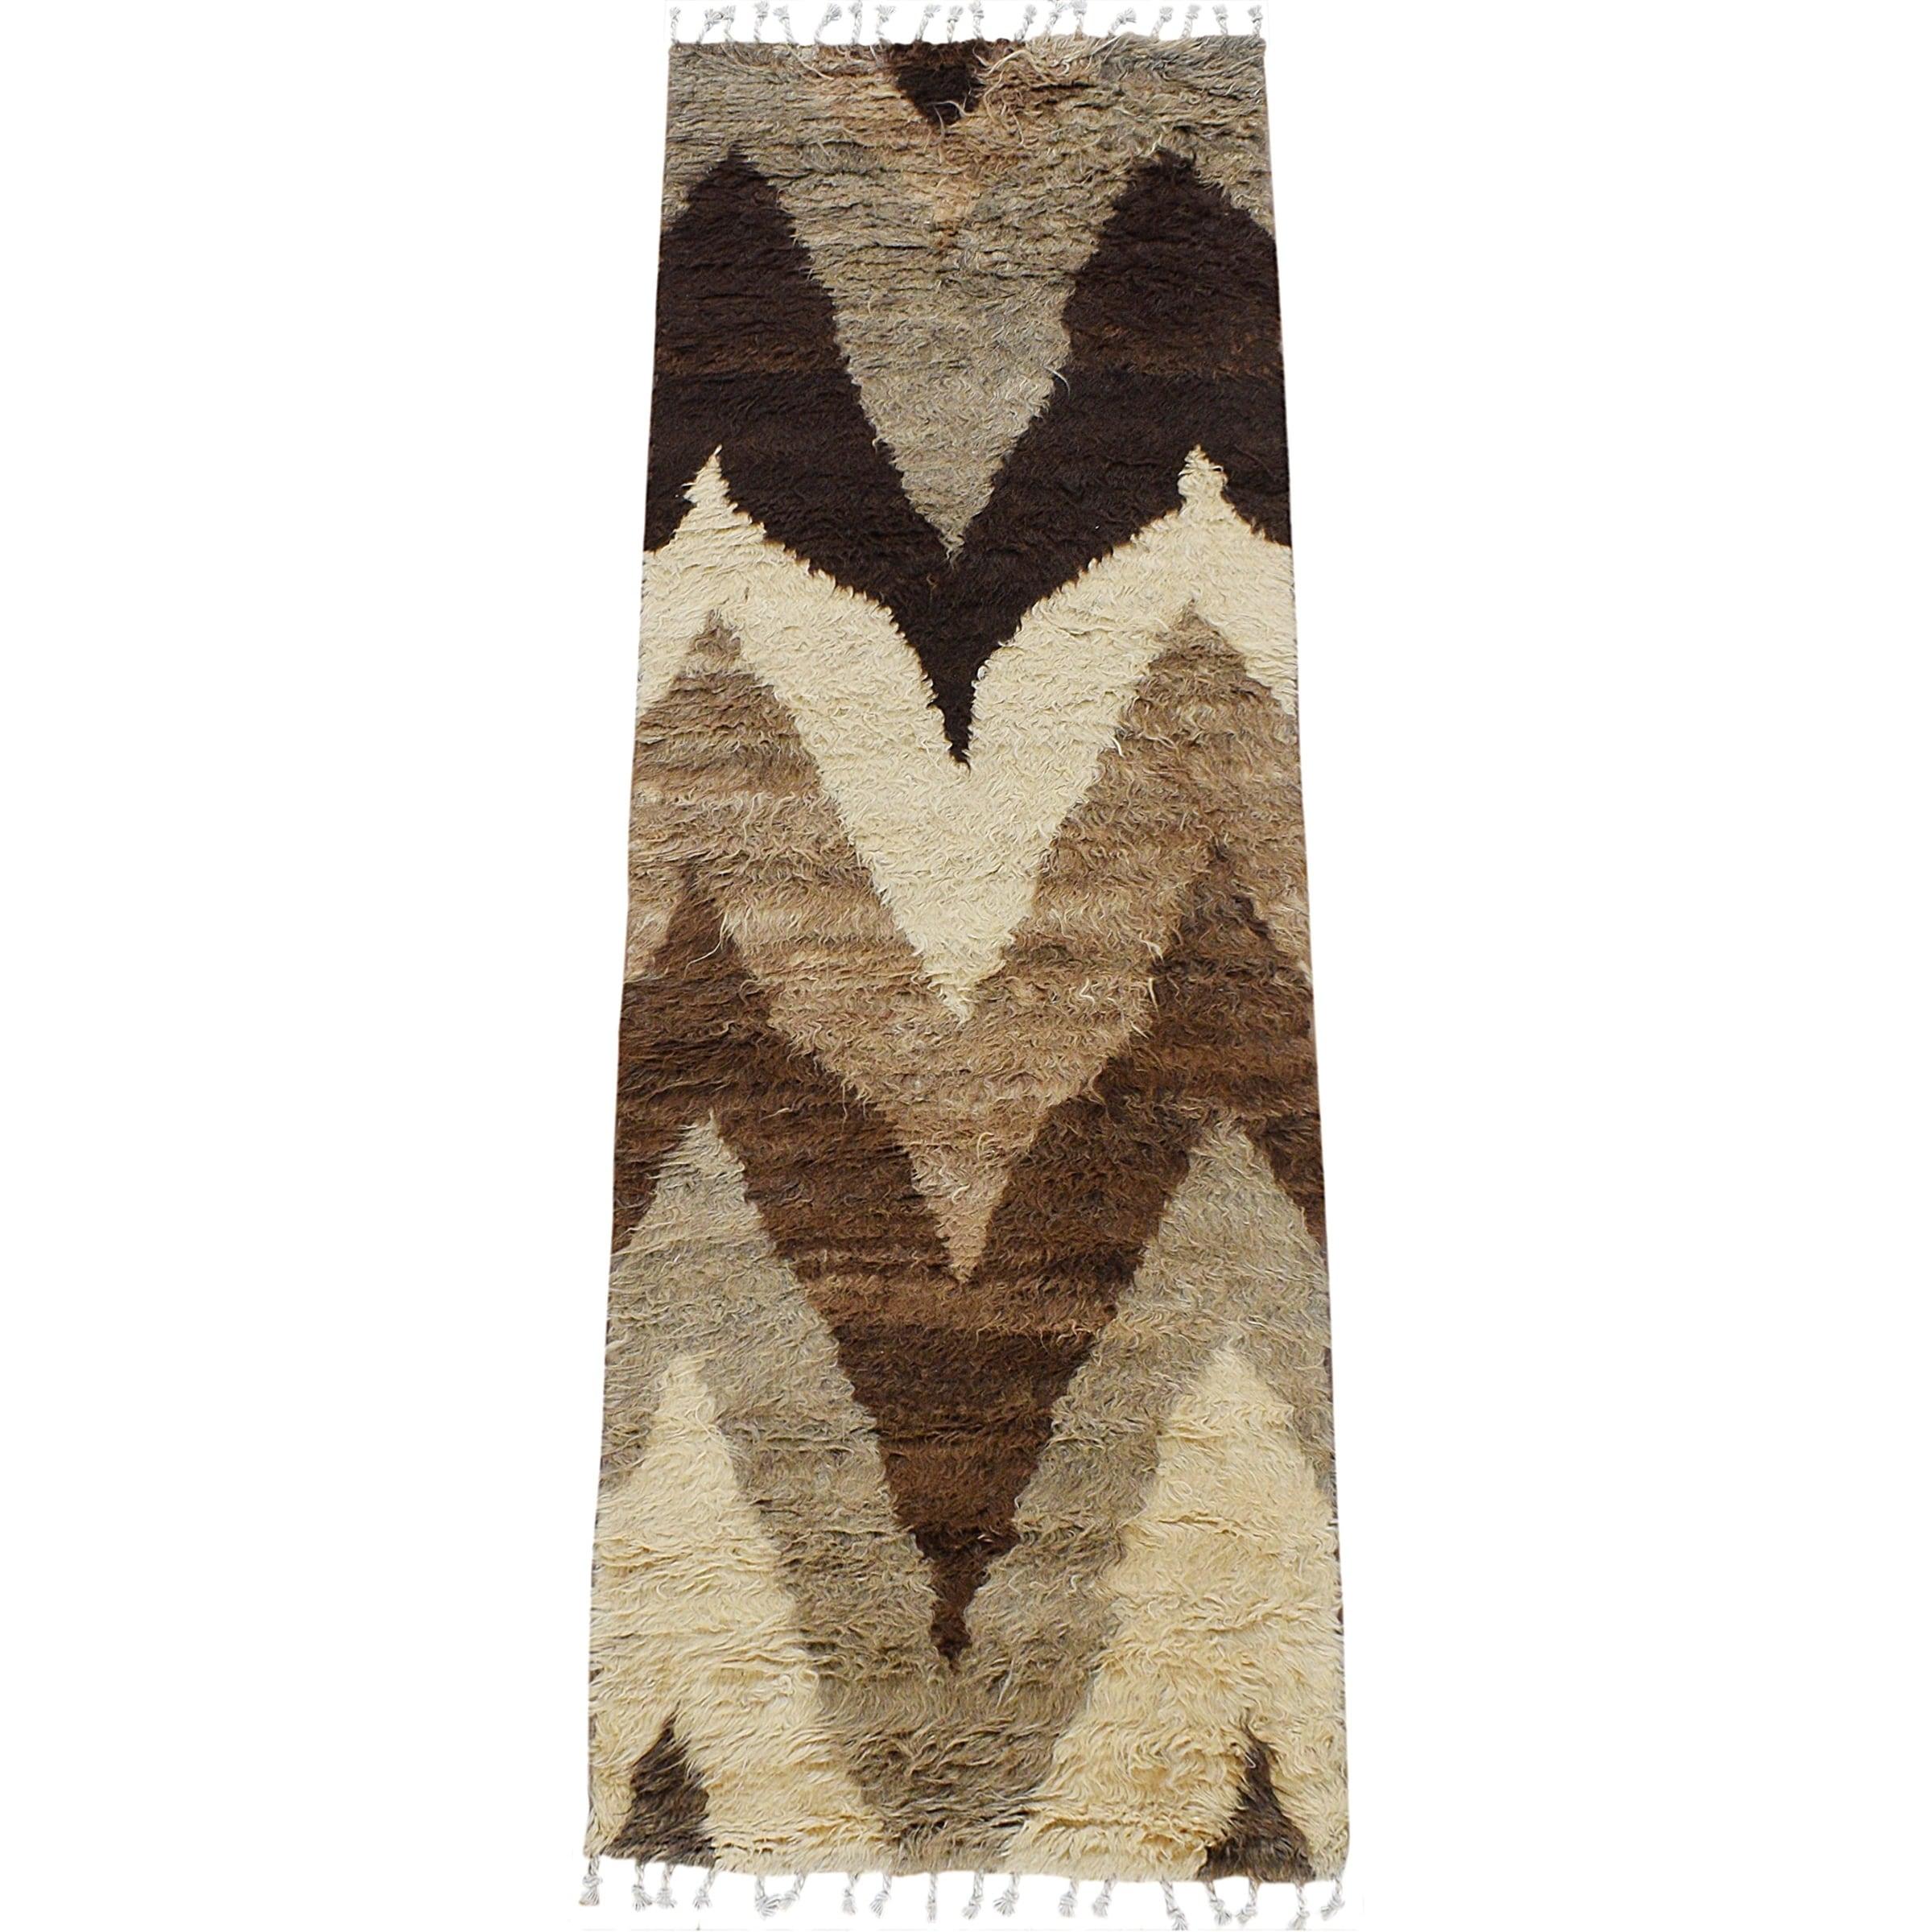 Image of: Shop Chevron Modern Plush Shaggy Moroccan Staircase Runner Rug Handmade 2 8 X 7 8 On Sale Overstock 30985098